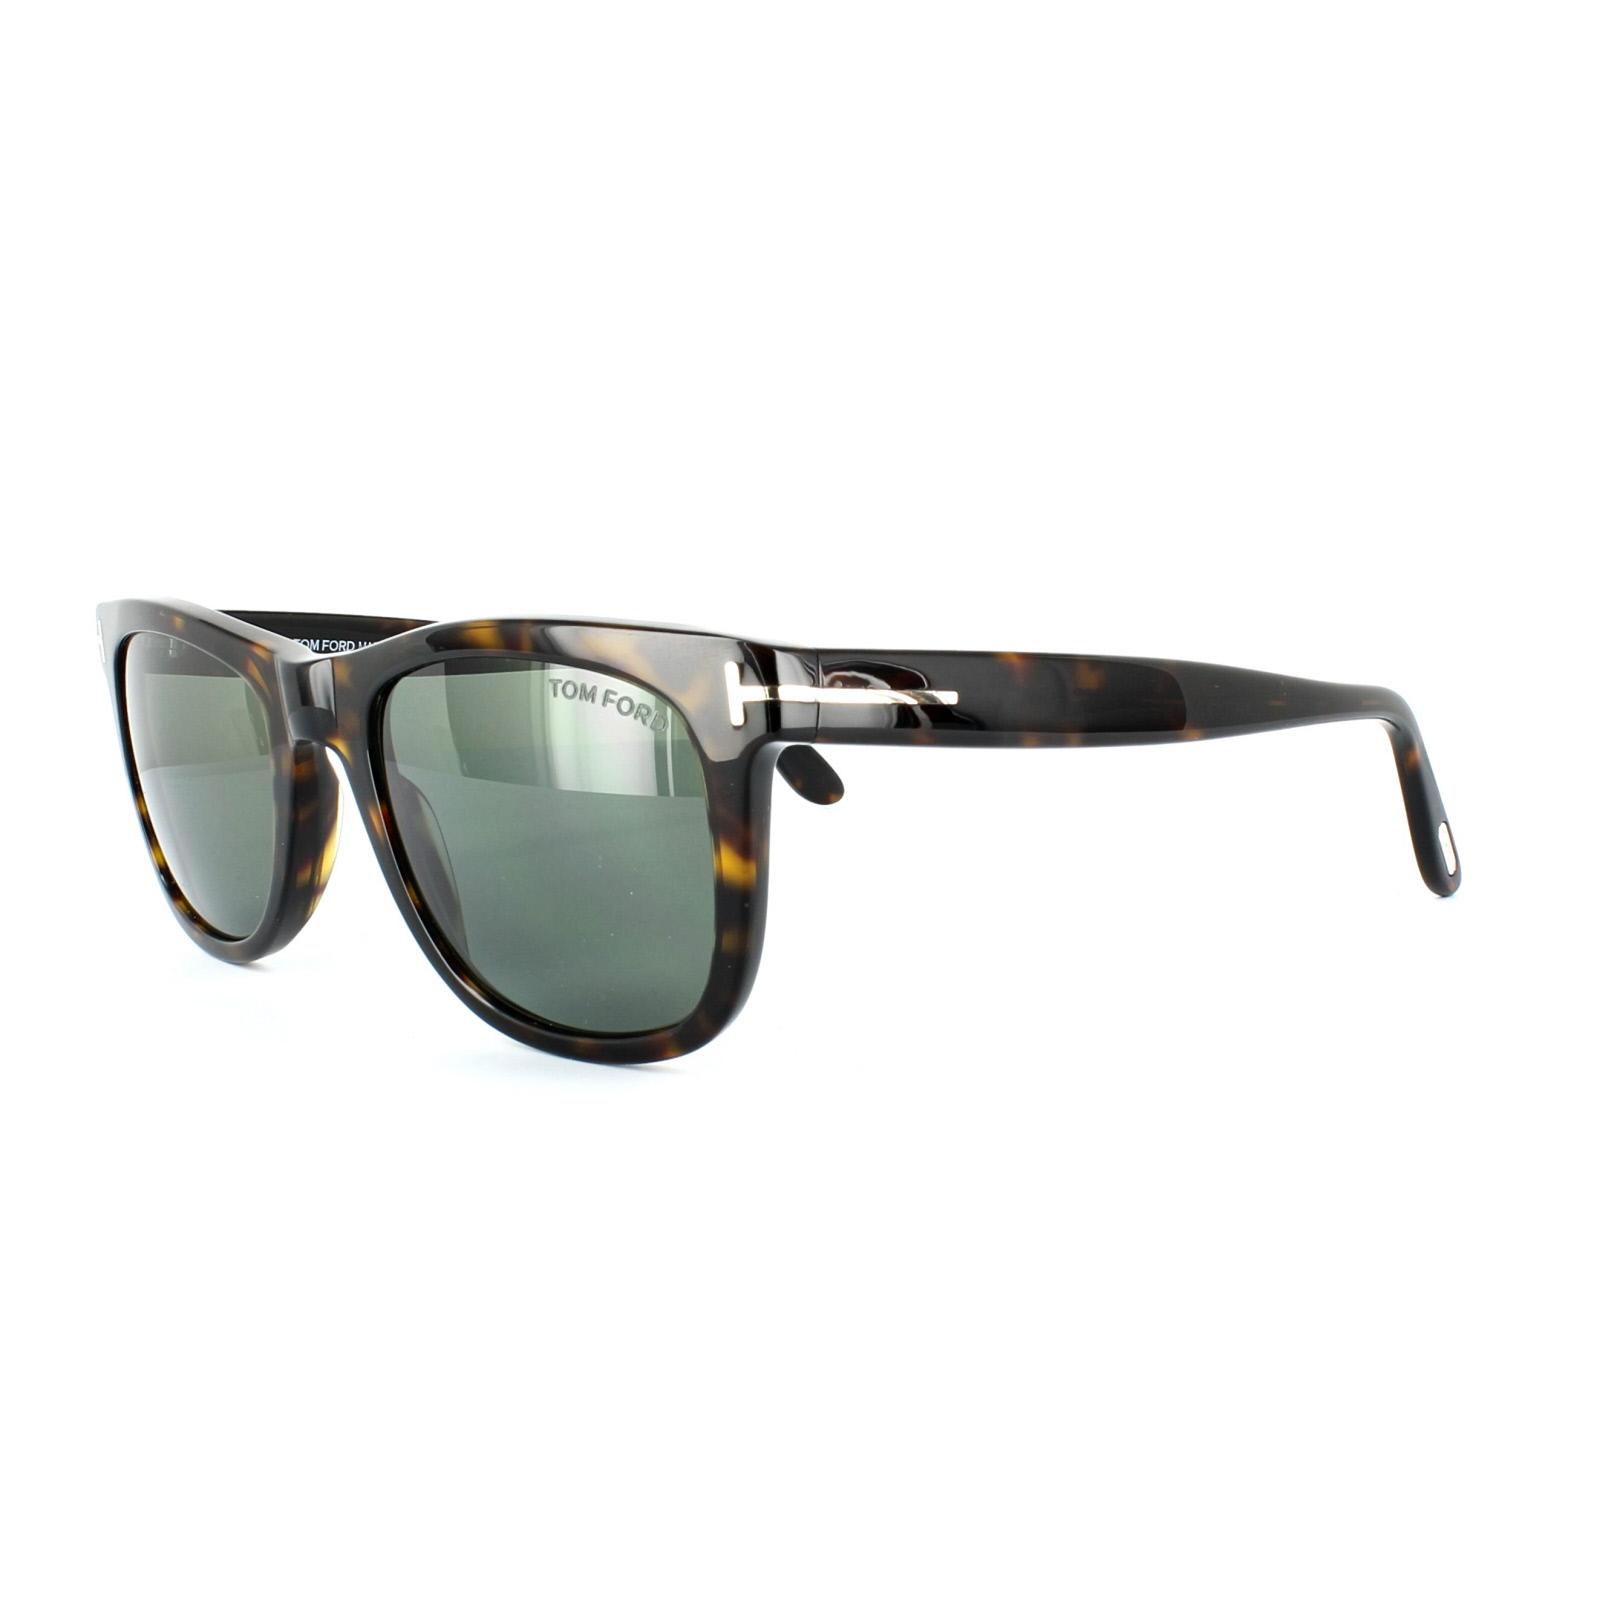 cc5ea0dfdfe Sentinel Thumbnail 1. Sentinel Tom Ford Sunglasses 0336 Leo 56R Havana  Brown Green Polarized